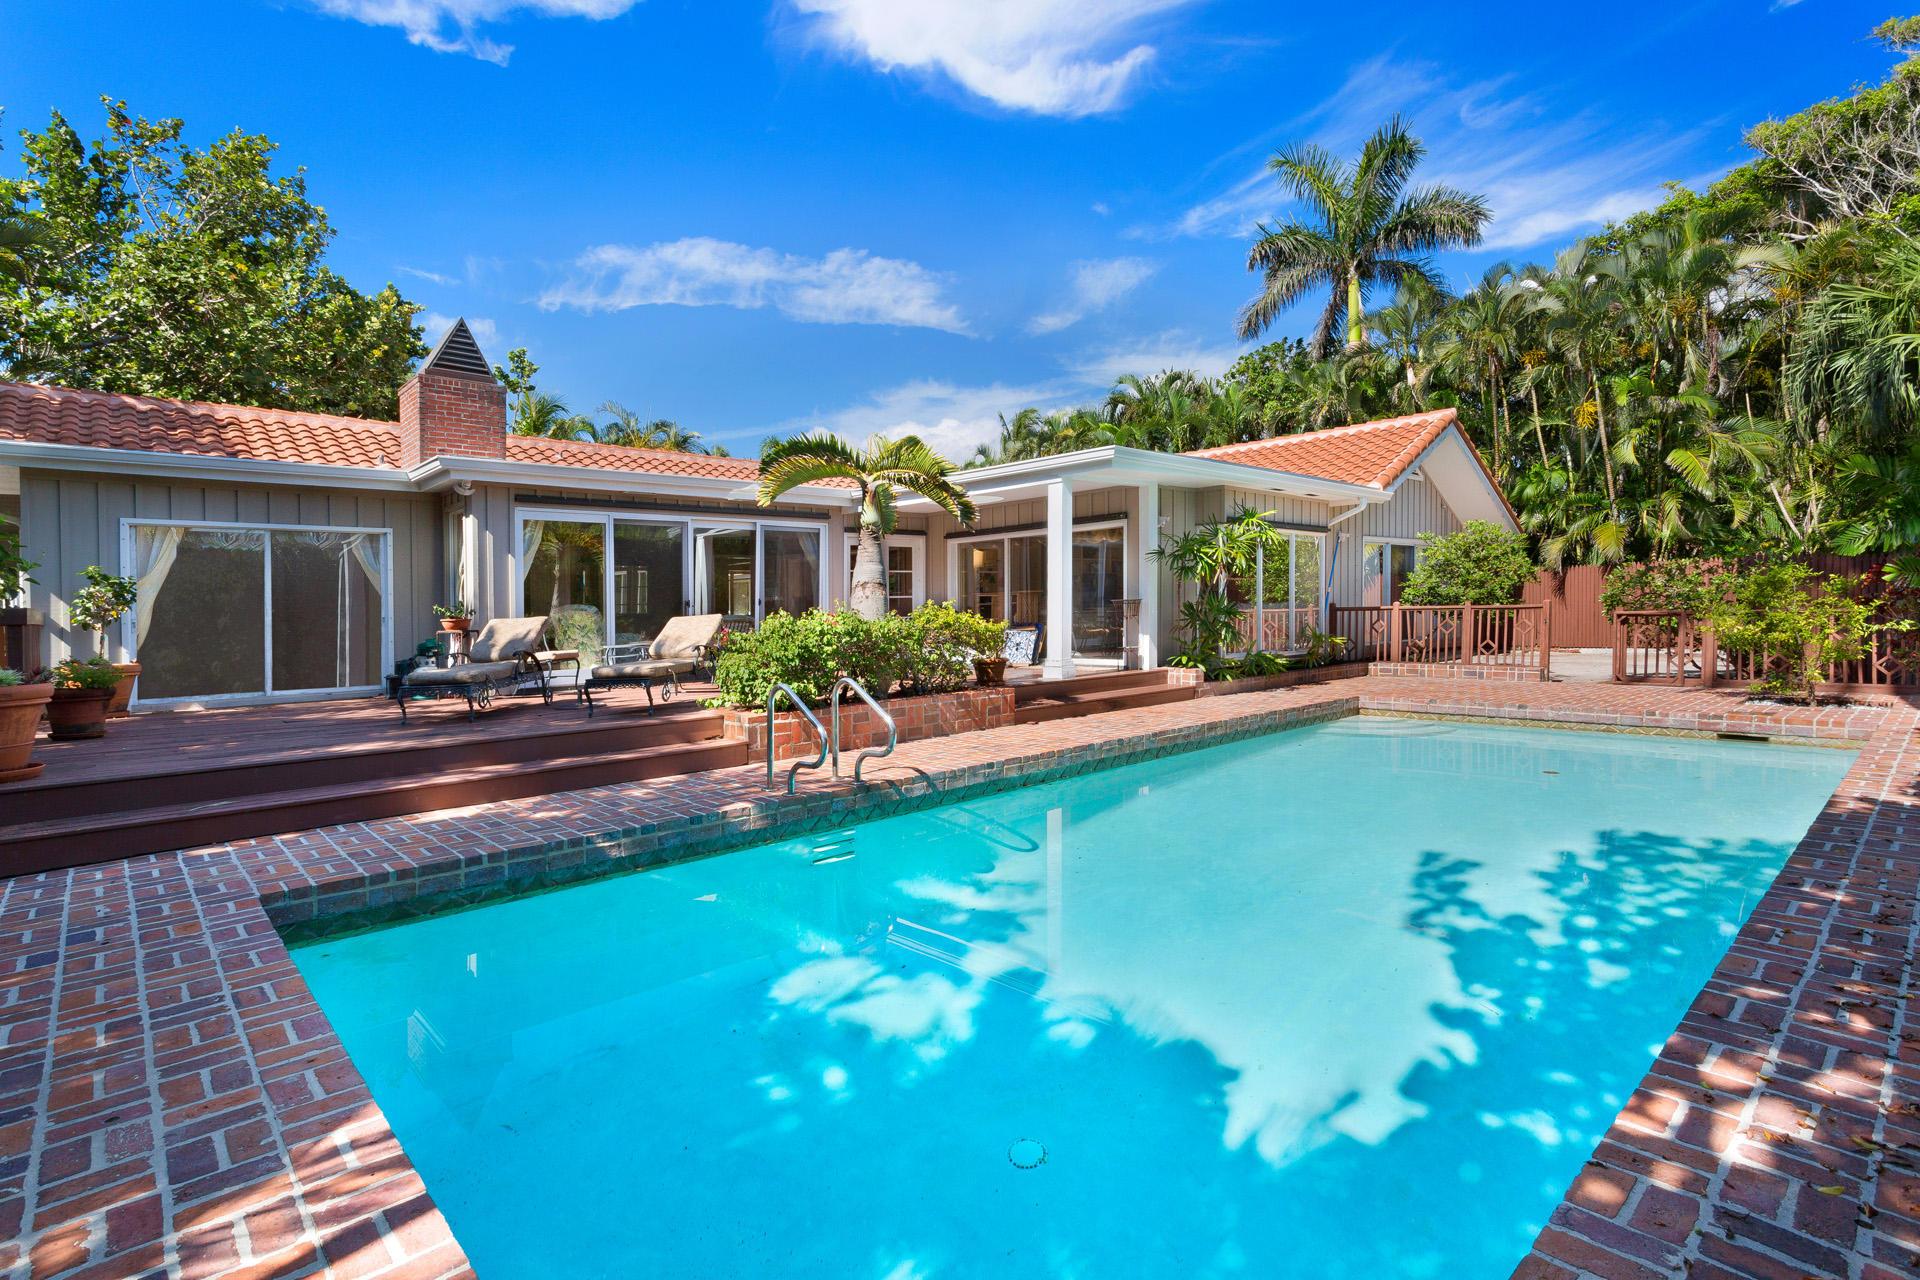 206 Seabreeze Avenue  Delray Beach, FL 33483